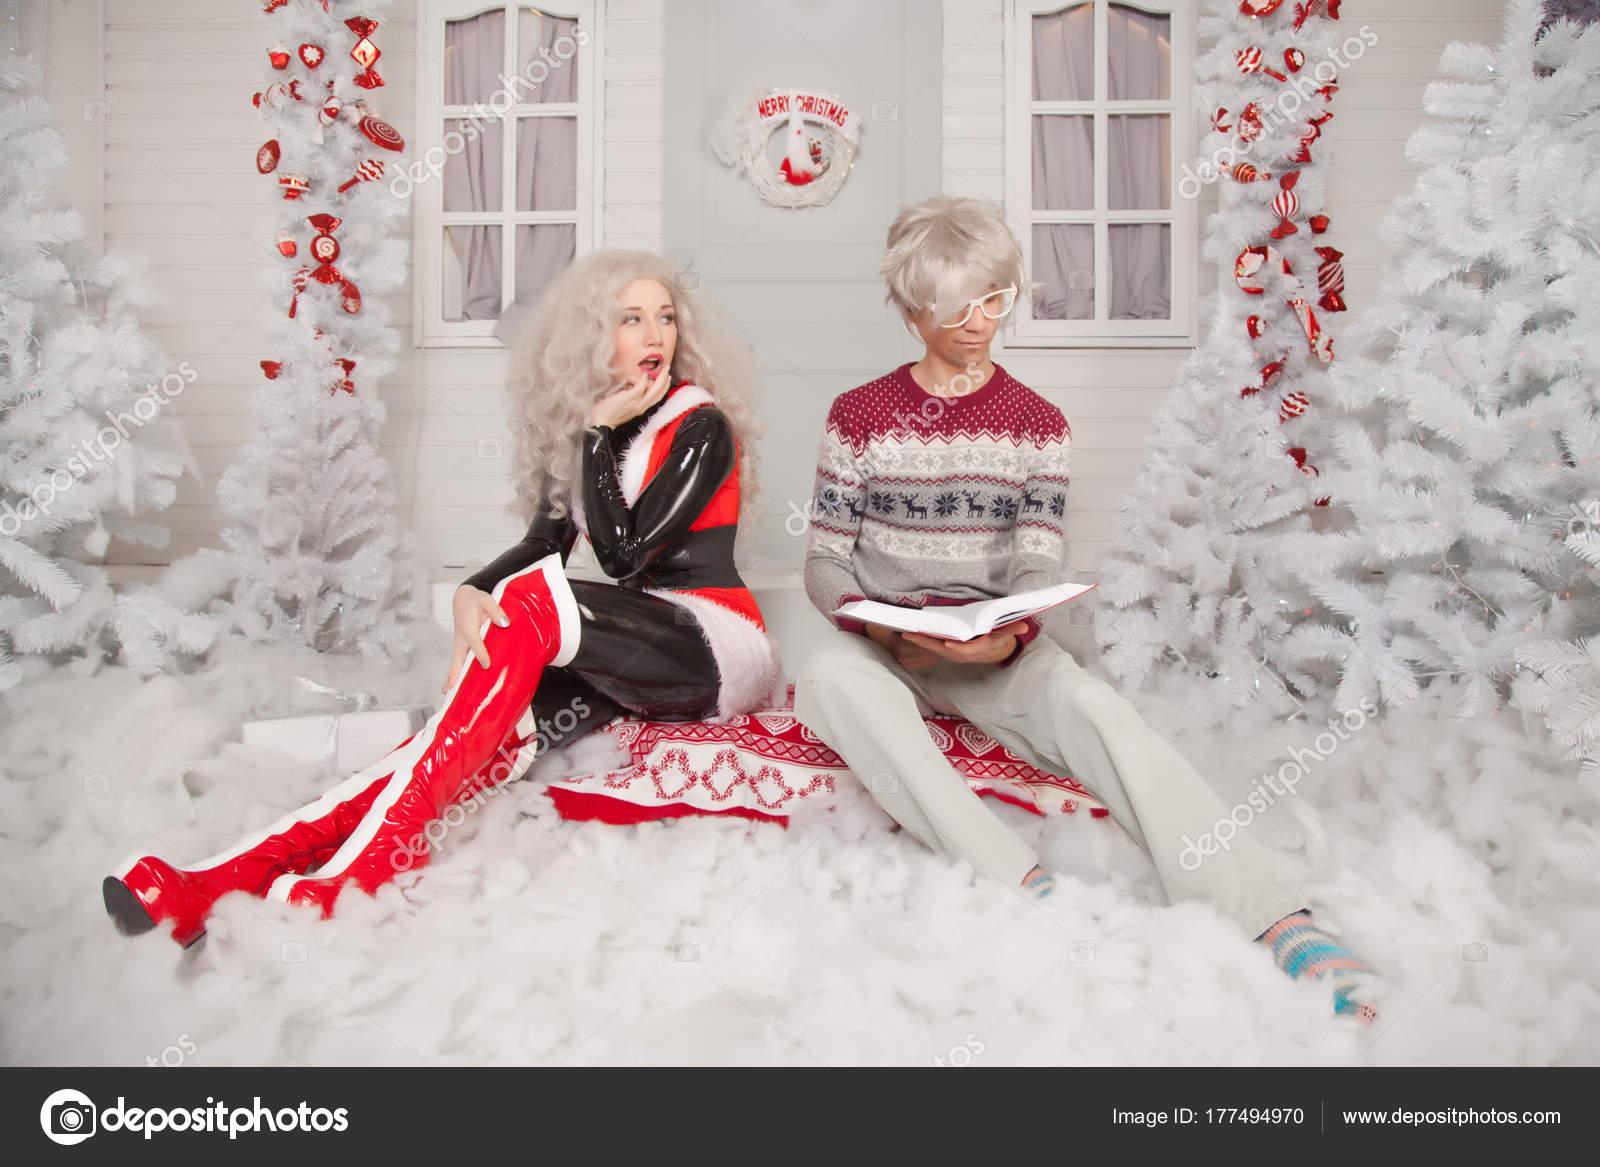 young girl seduces woman